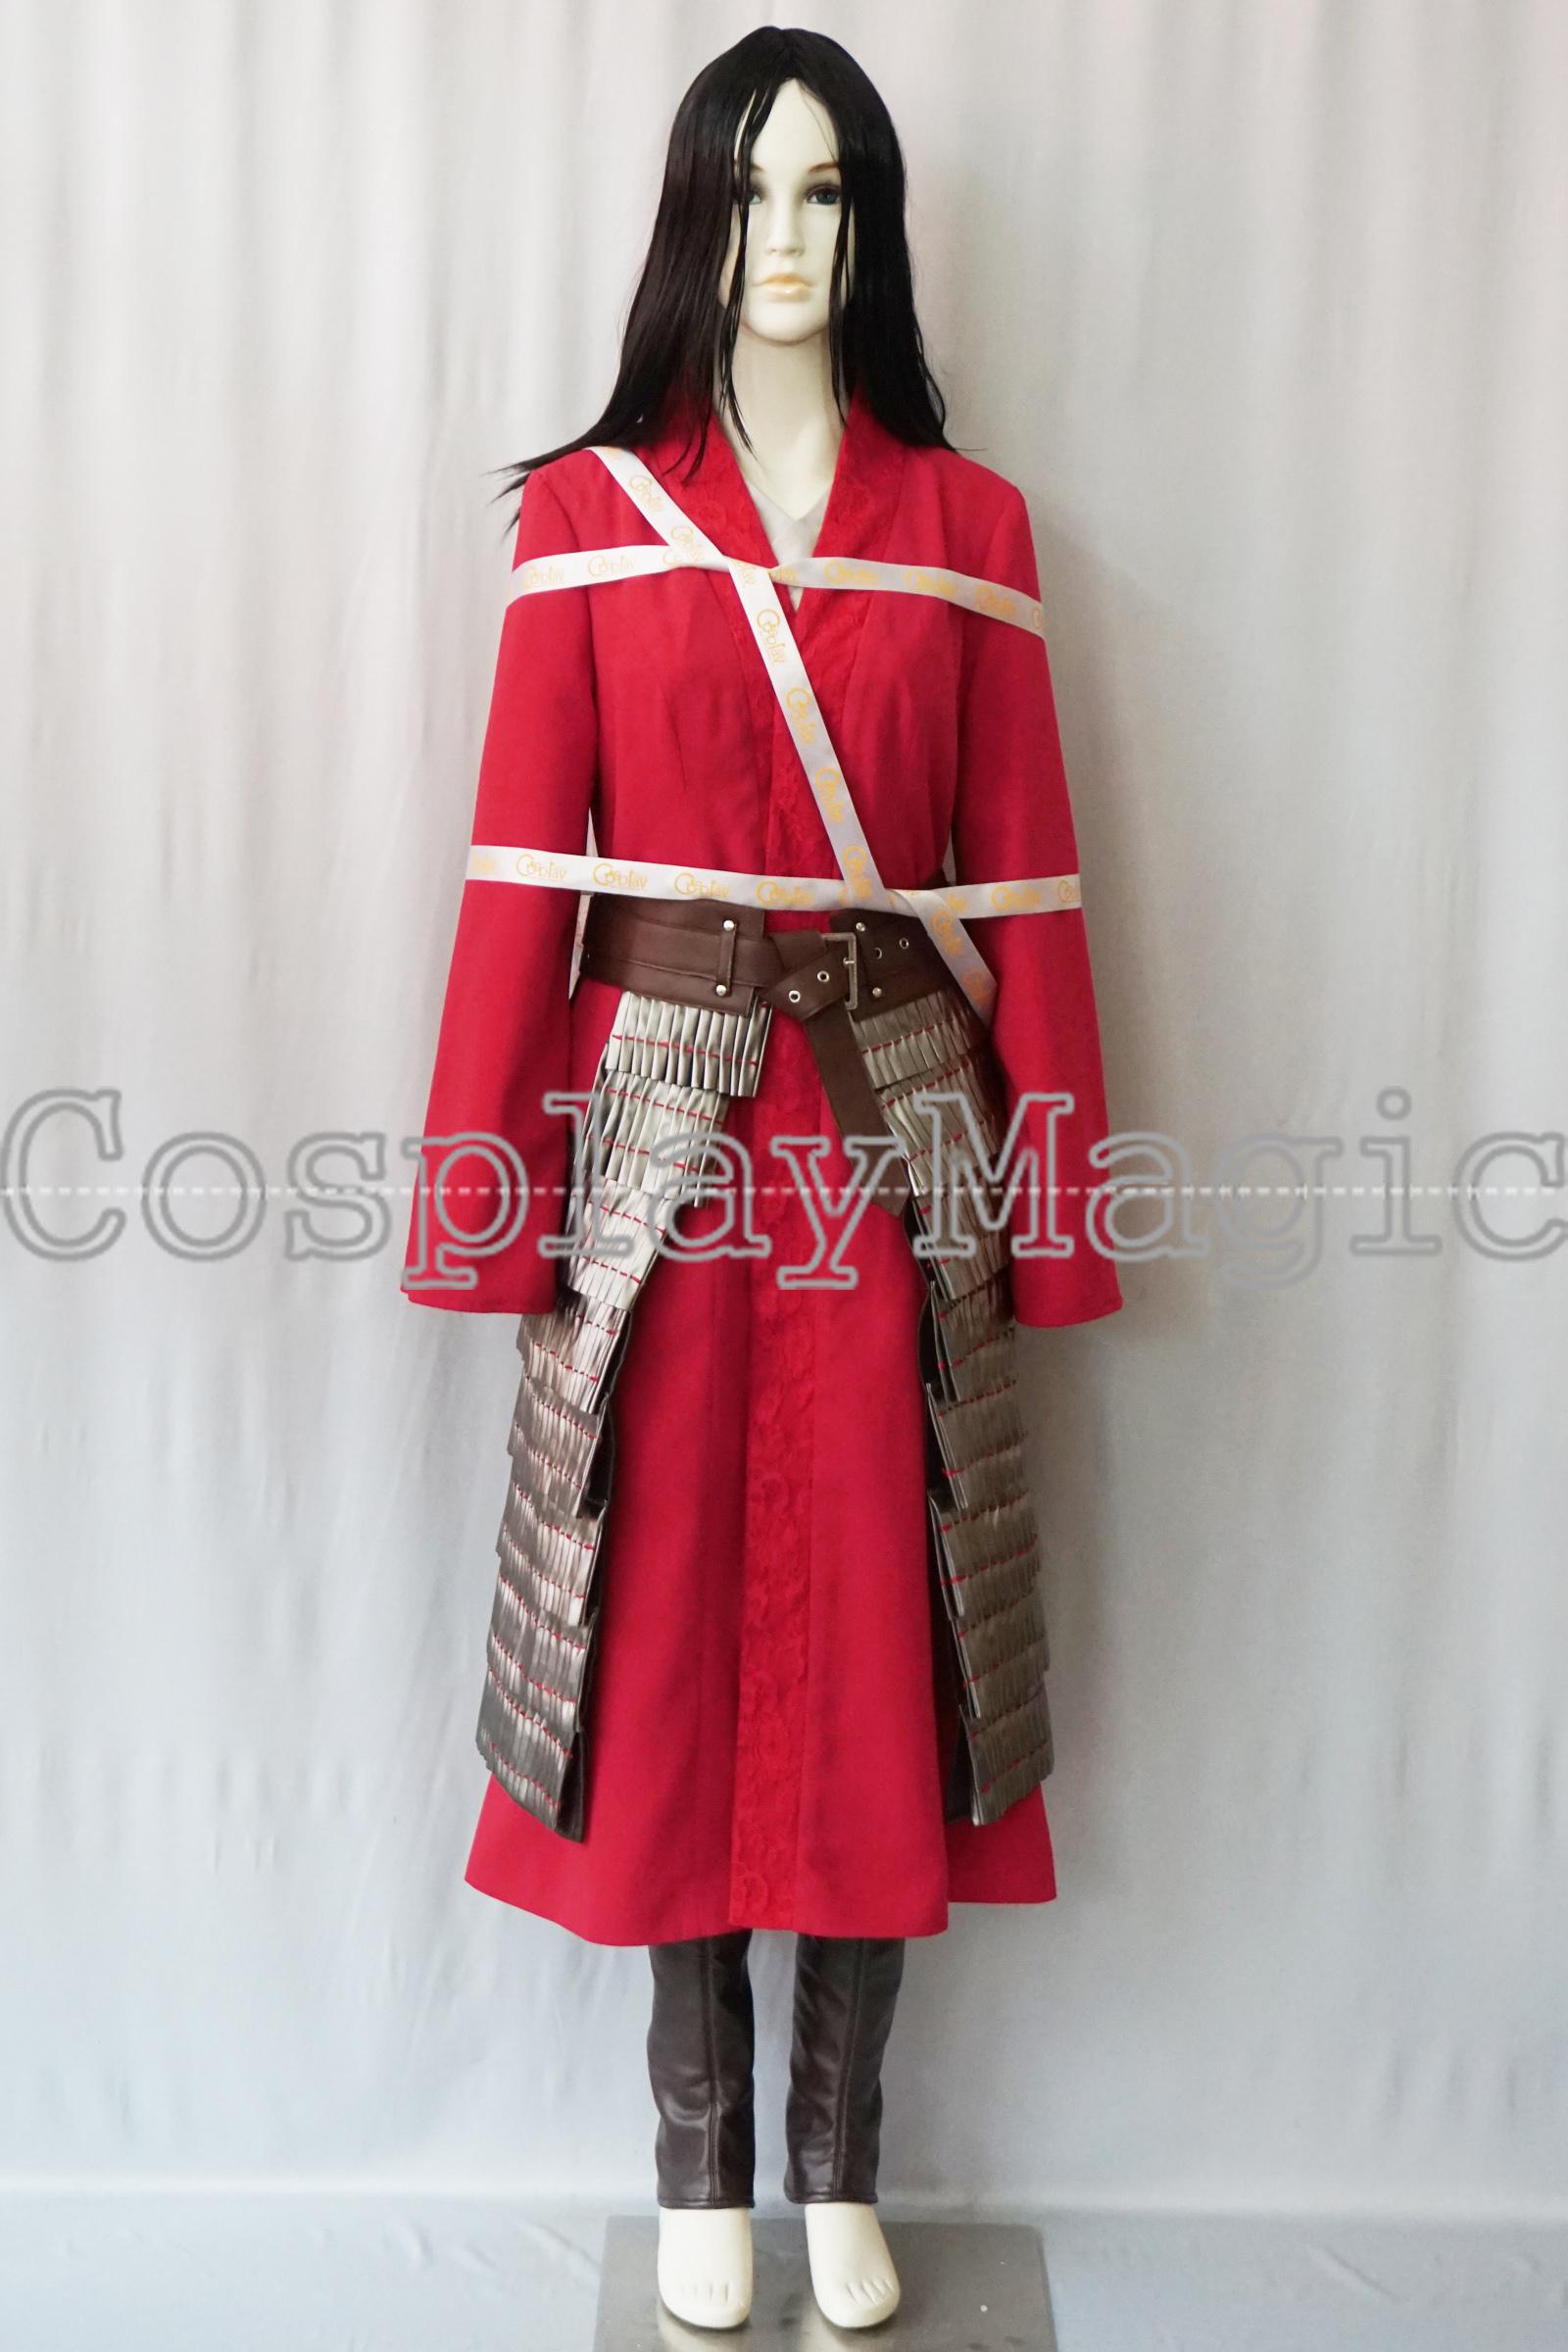 New Mulan 2020 Cosplay Costume Cosplaymagic Com